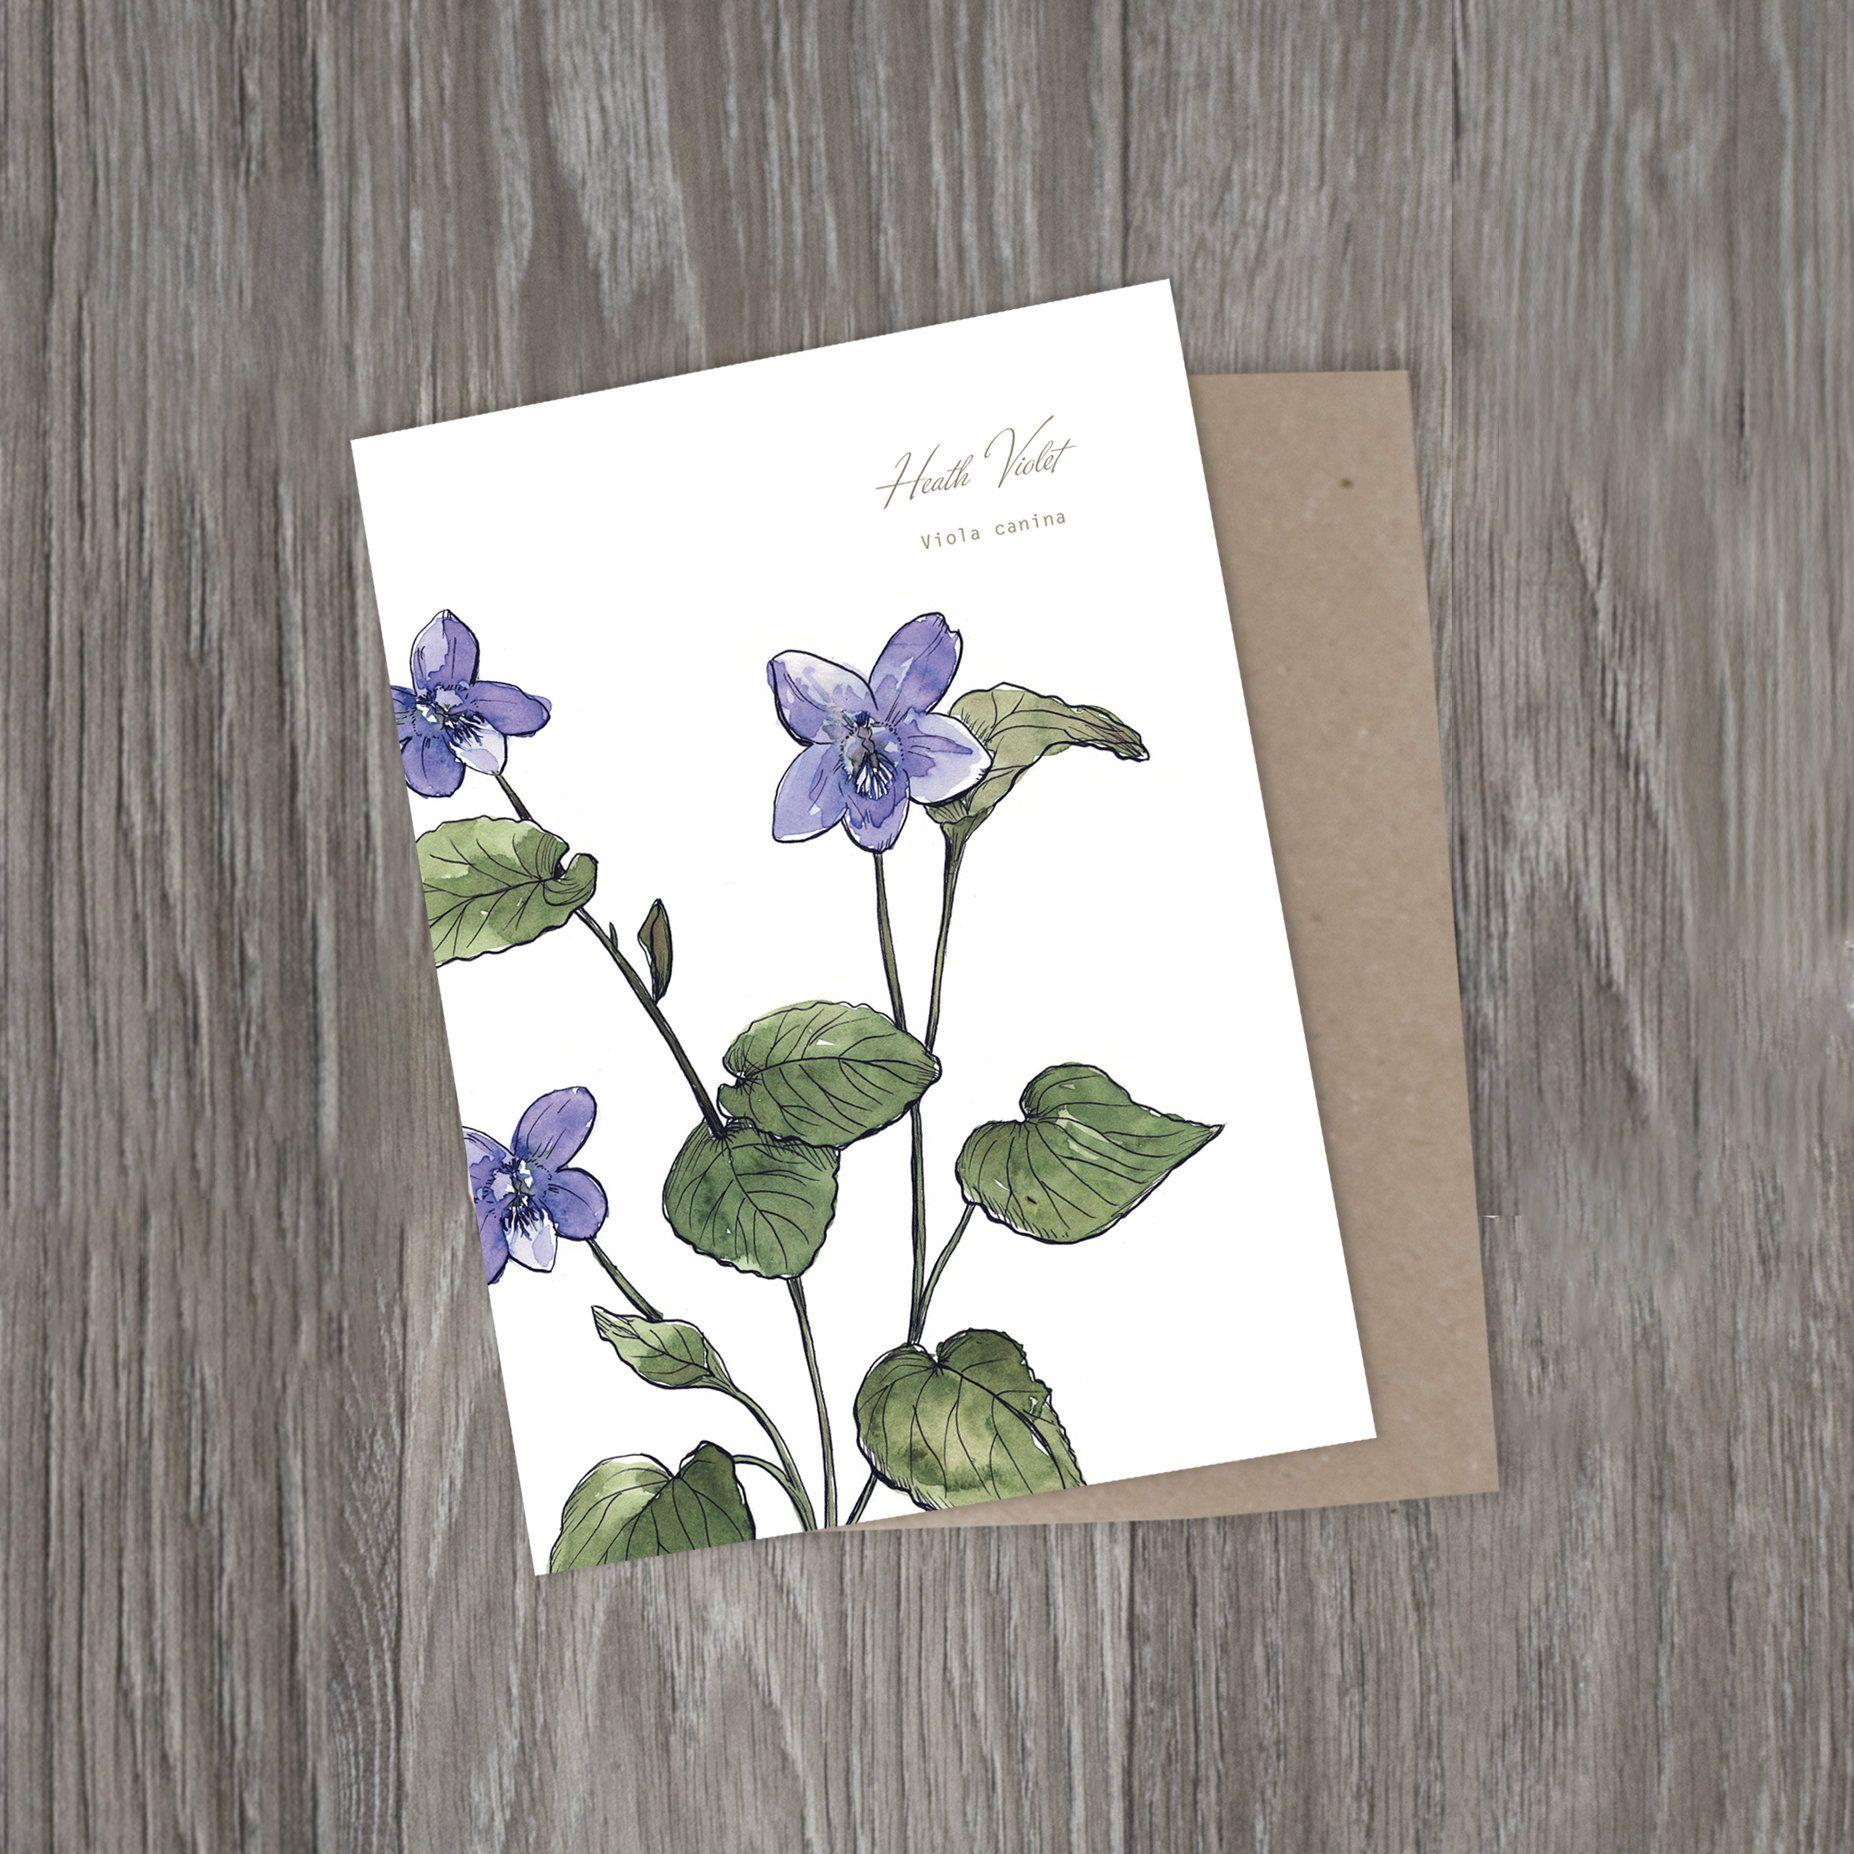 Heath Violet Purple Wild Flower Botanical Watercolour Print Blank Notecard Scottish Plant Illustrat Plant Illustration Botanical Watercolor Watercolor Print